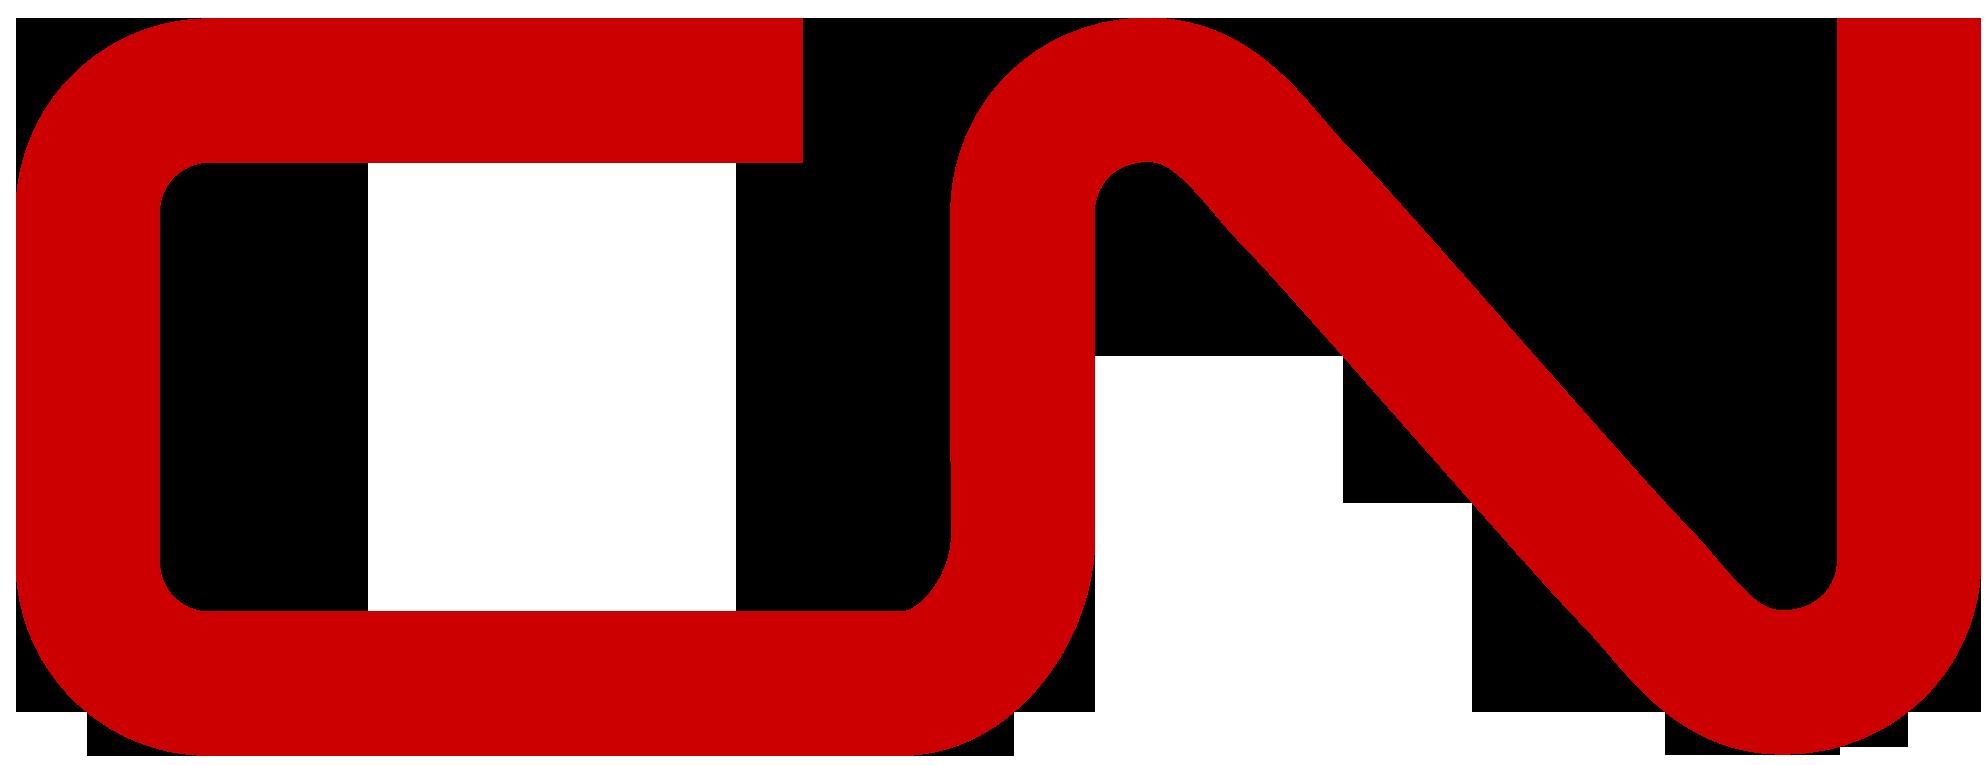 Canadian National Railway (NYSE:CNI) Company Logo